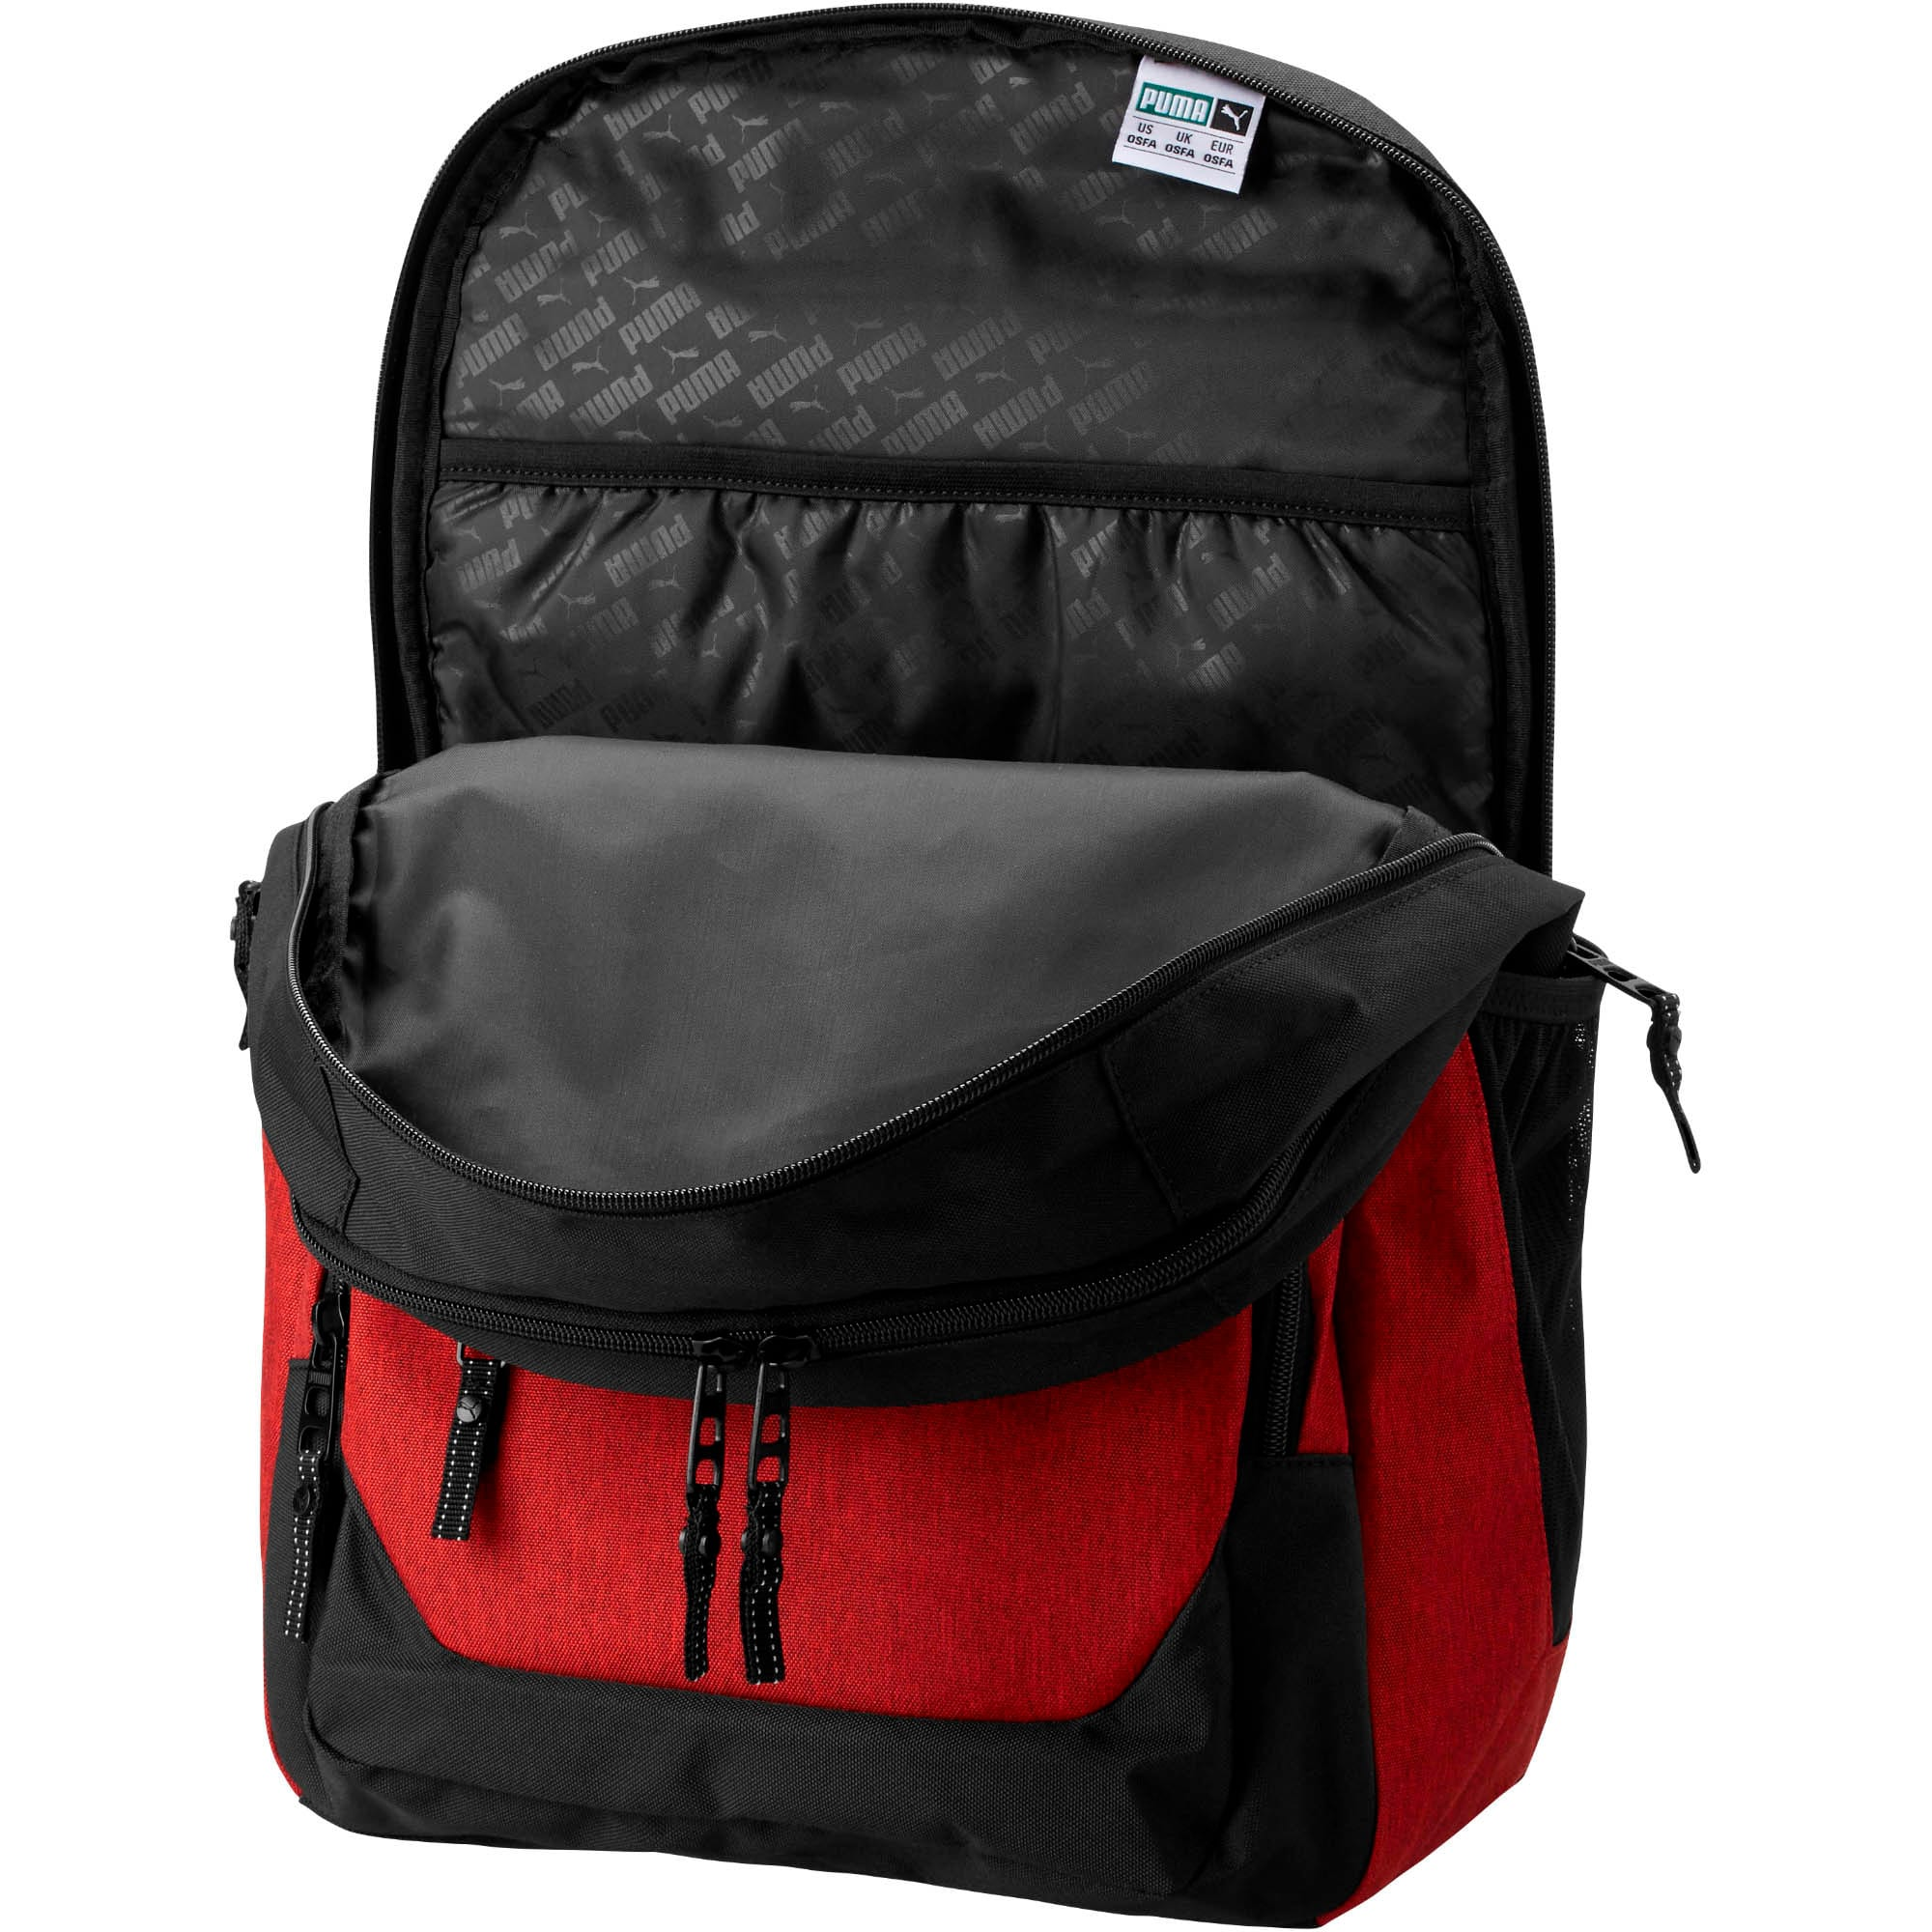 Thumbnail 2 of PUMA Everready Backpack, Red/Black, medium